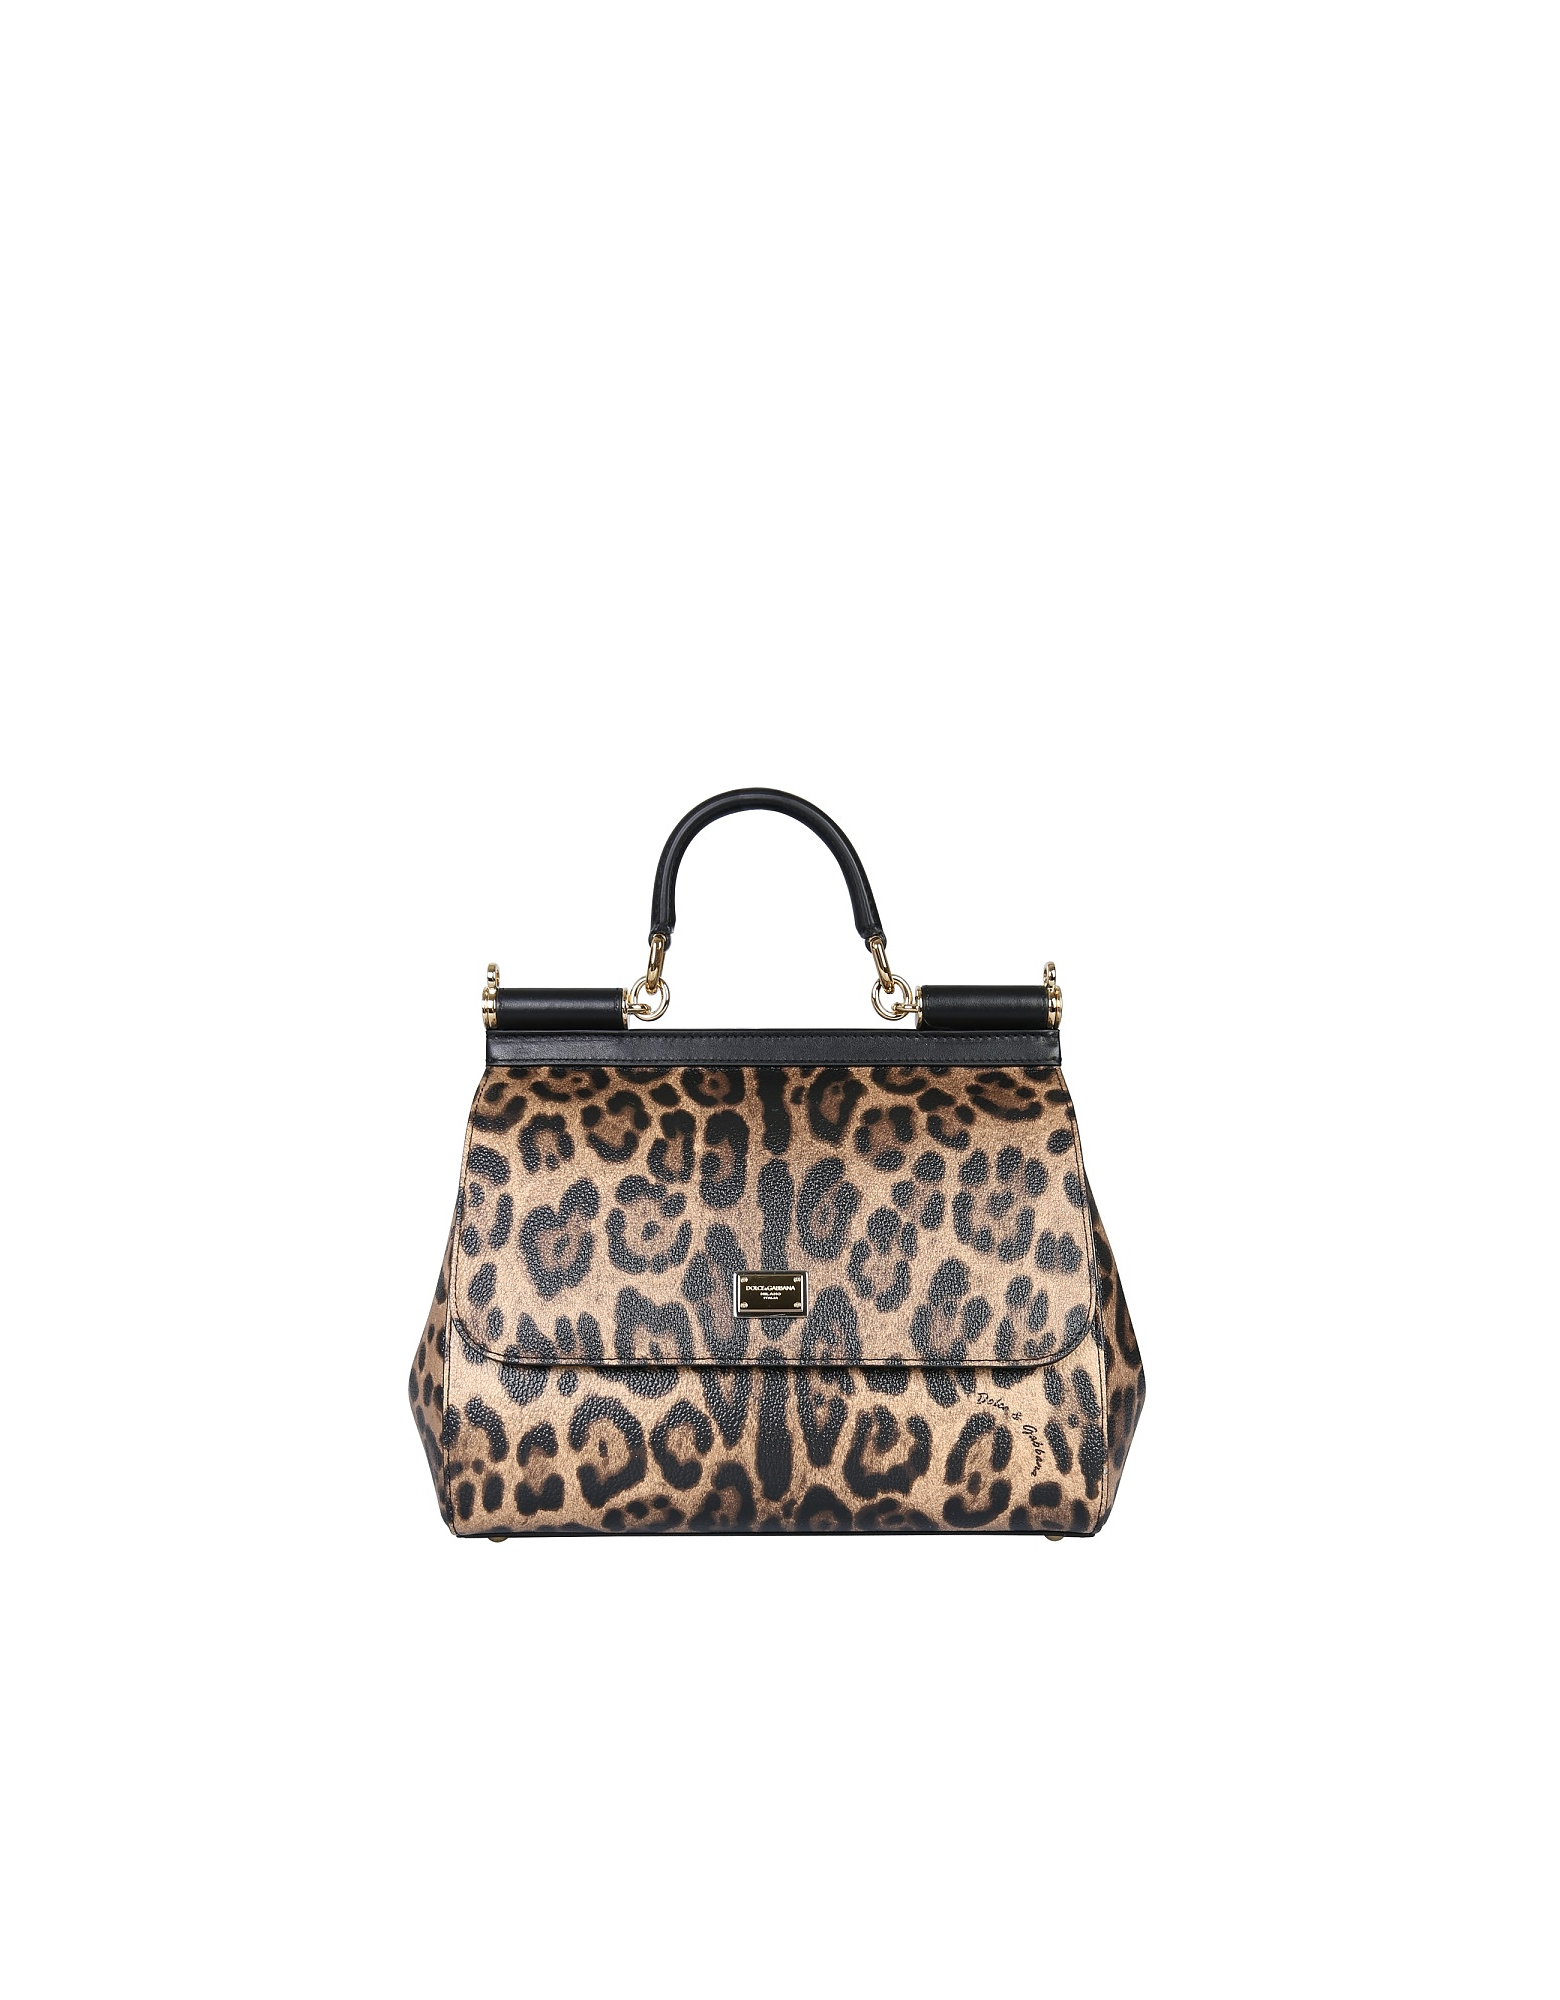 Dolce & Gabbana Bags MEDIUM SICILY BAG